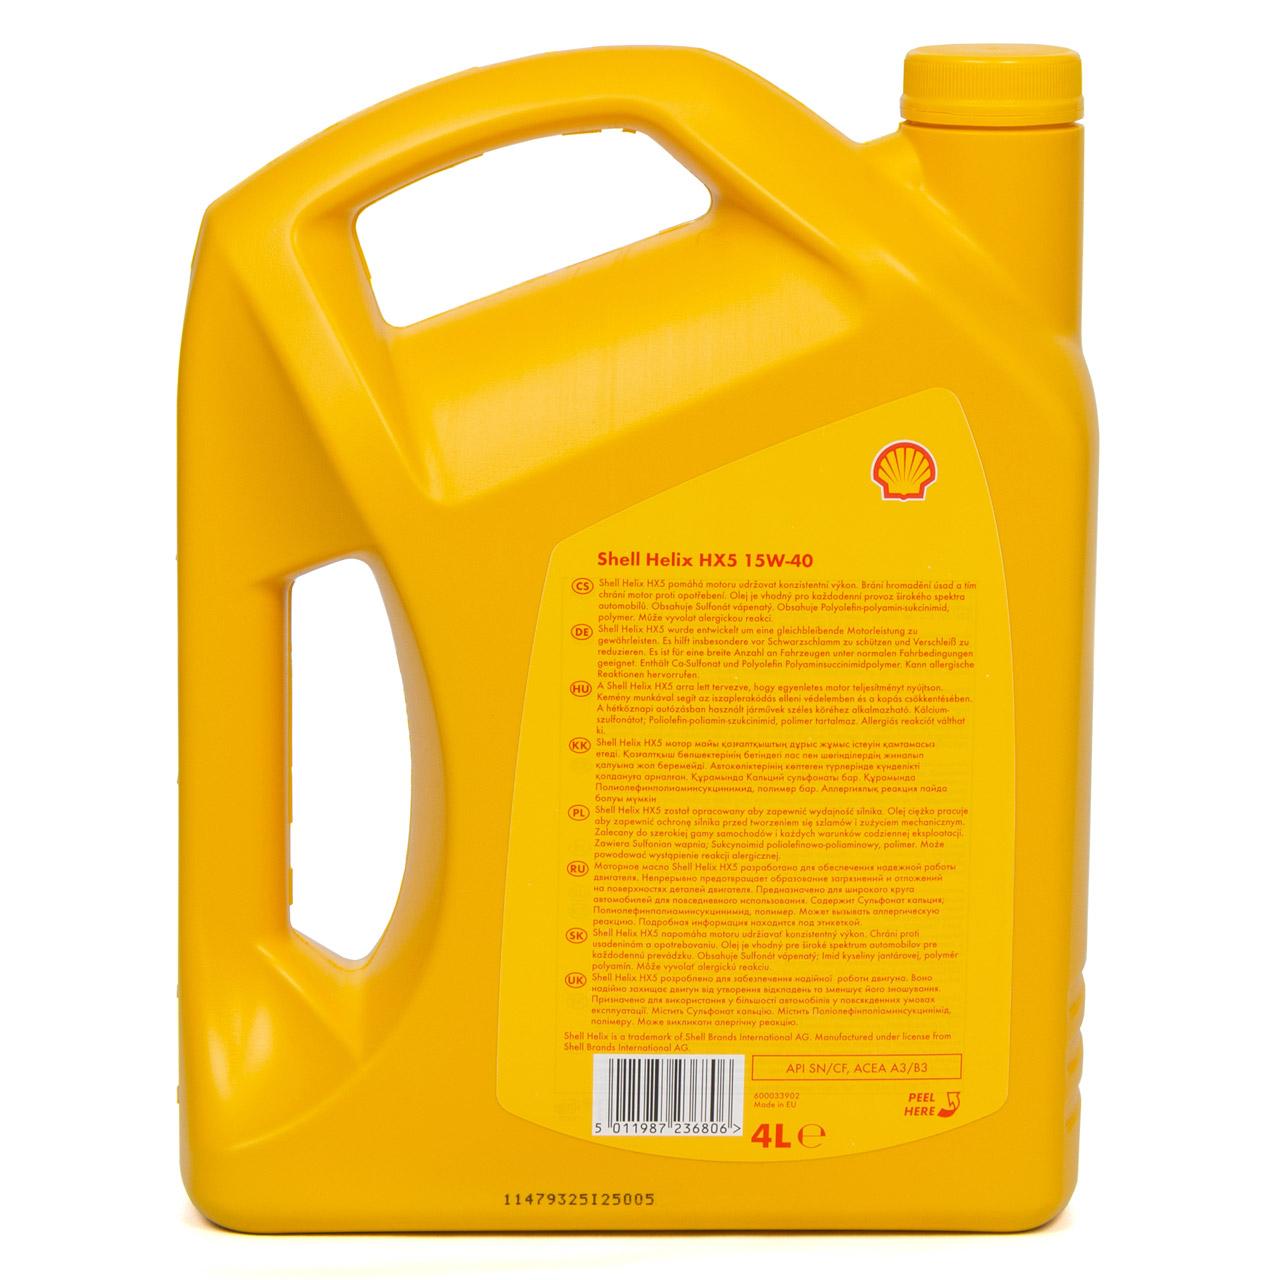 SHELL Motoröl Öl HELIX HX5 15W-40 15W40 API SN/CF ACEA A3/B3 - 4L 4 Liter